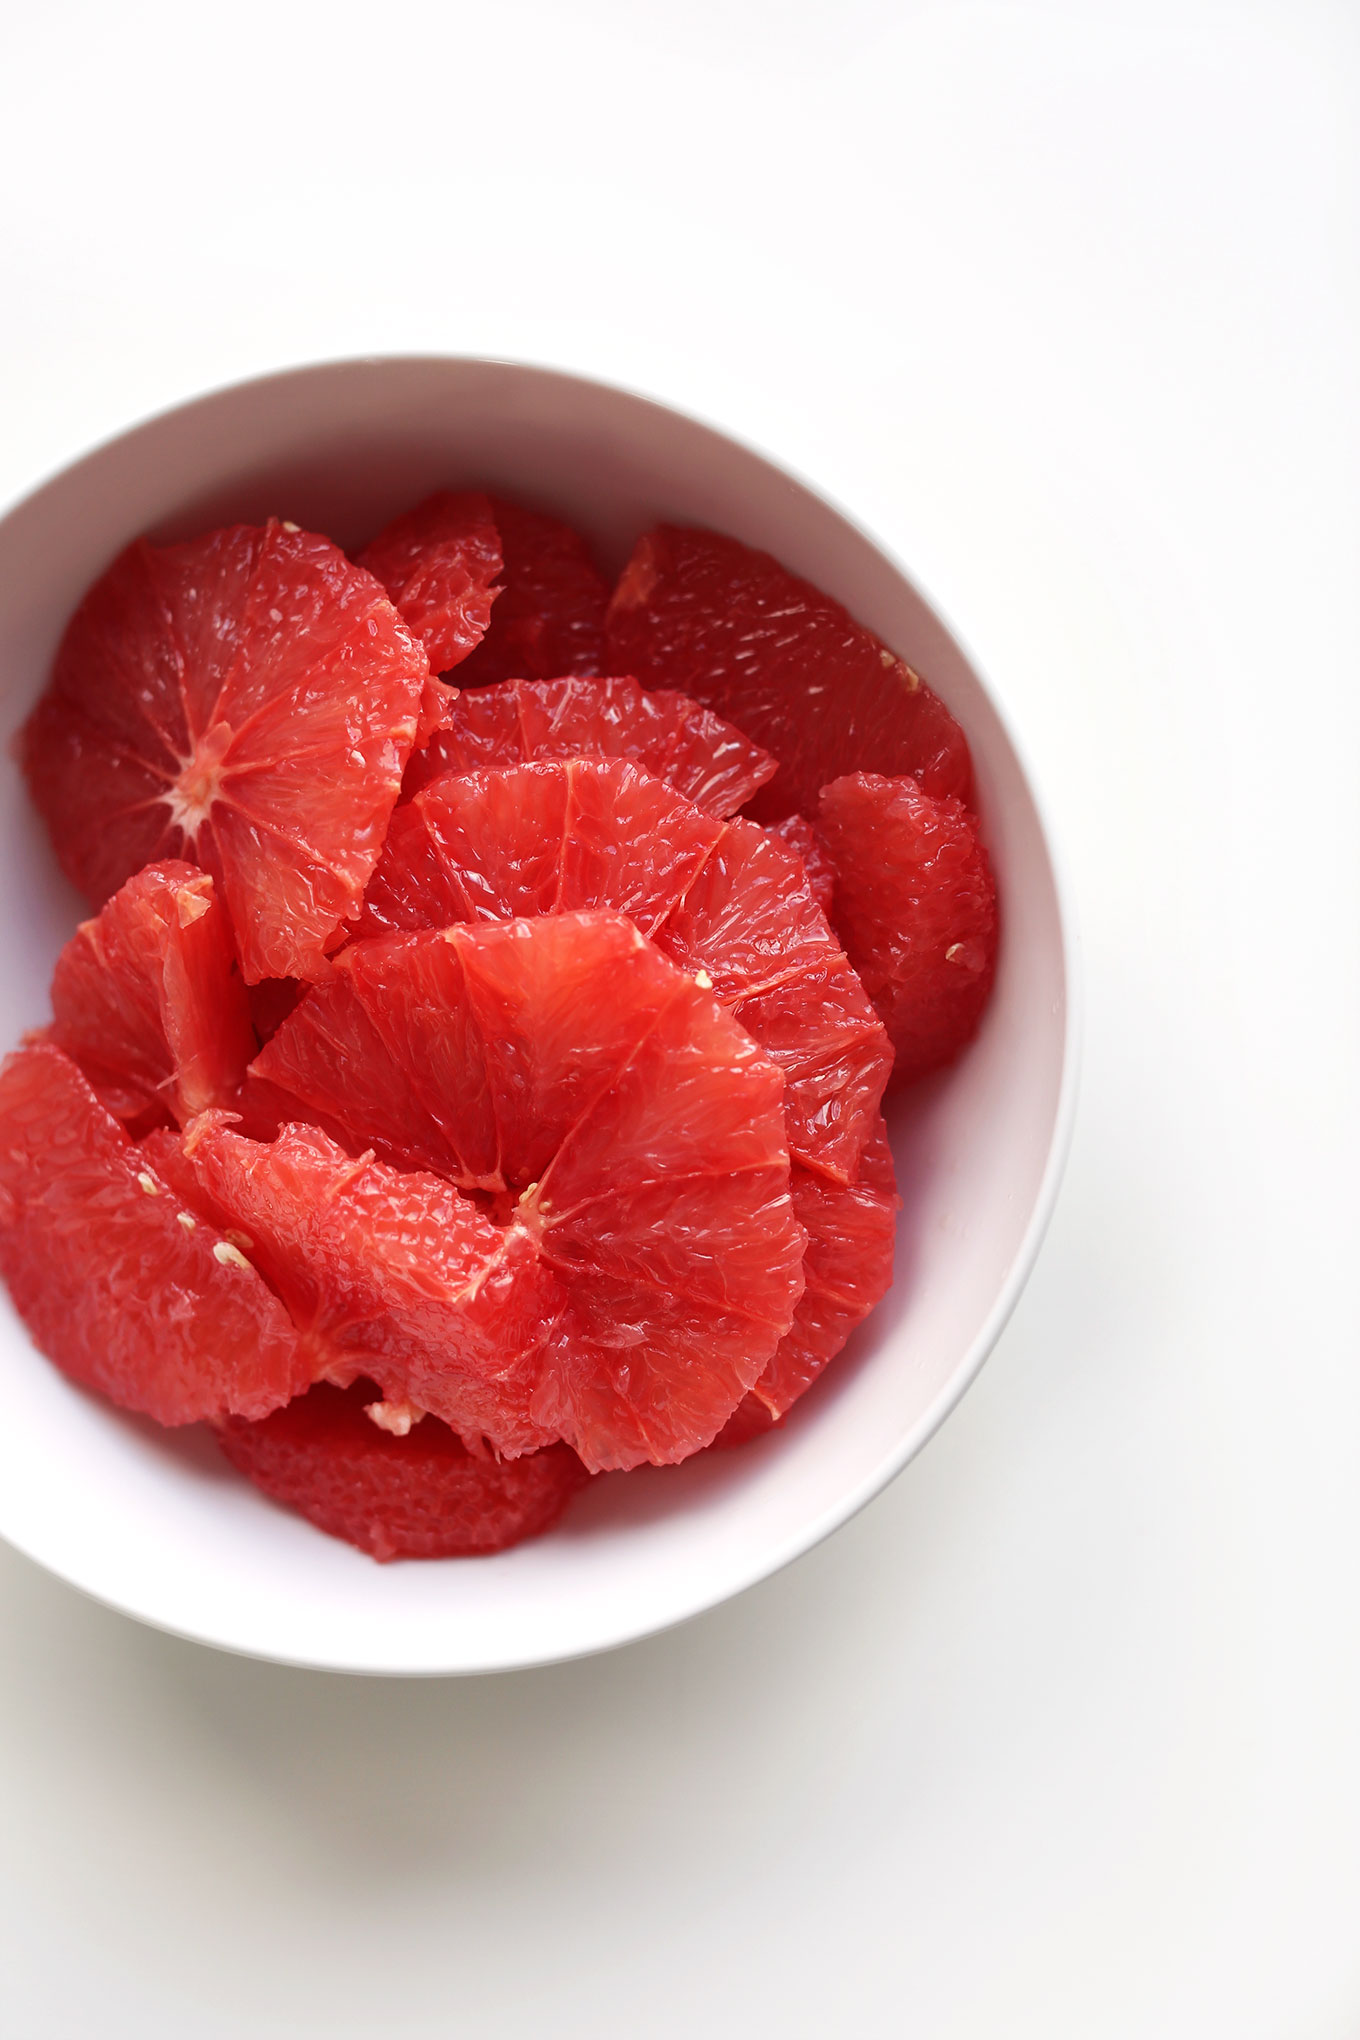 Bowl of fresh grapefruit slices for a Kale Citrus Salad Recipe